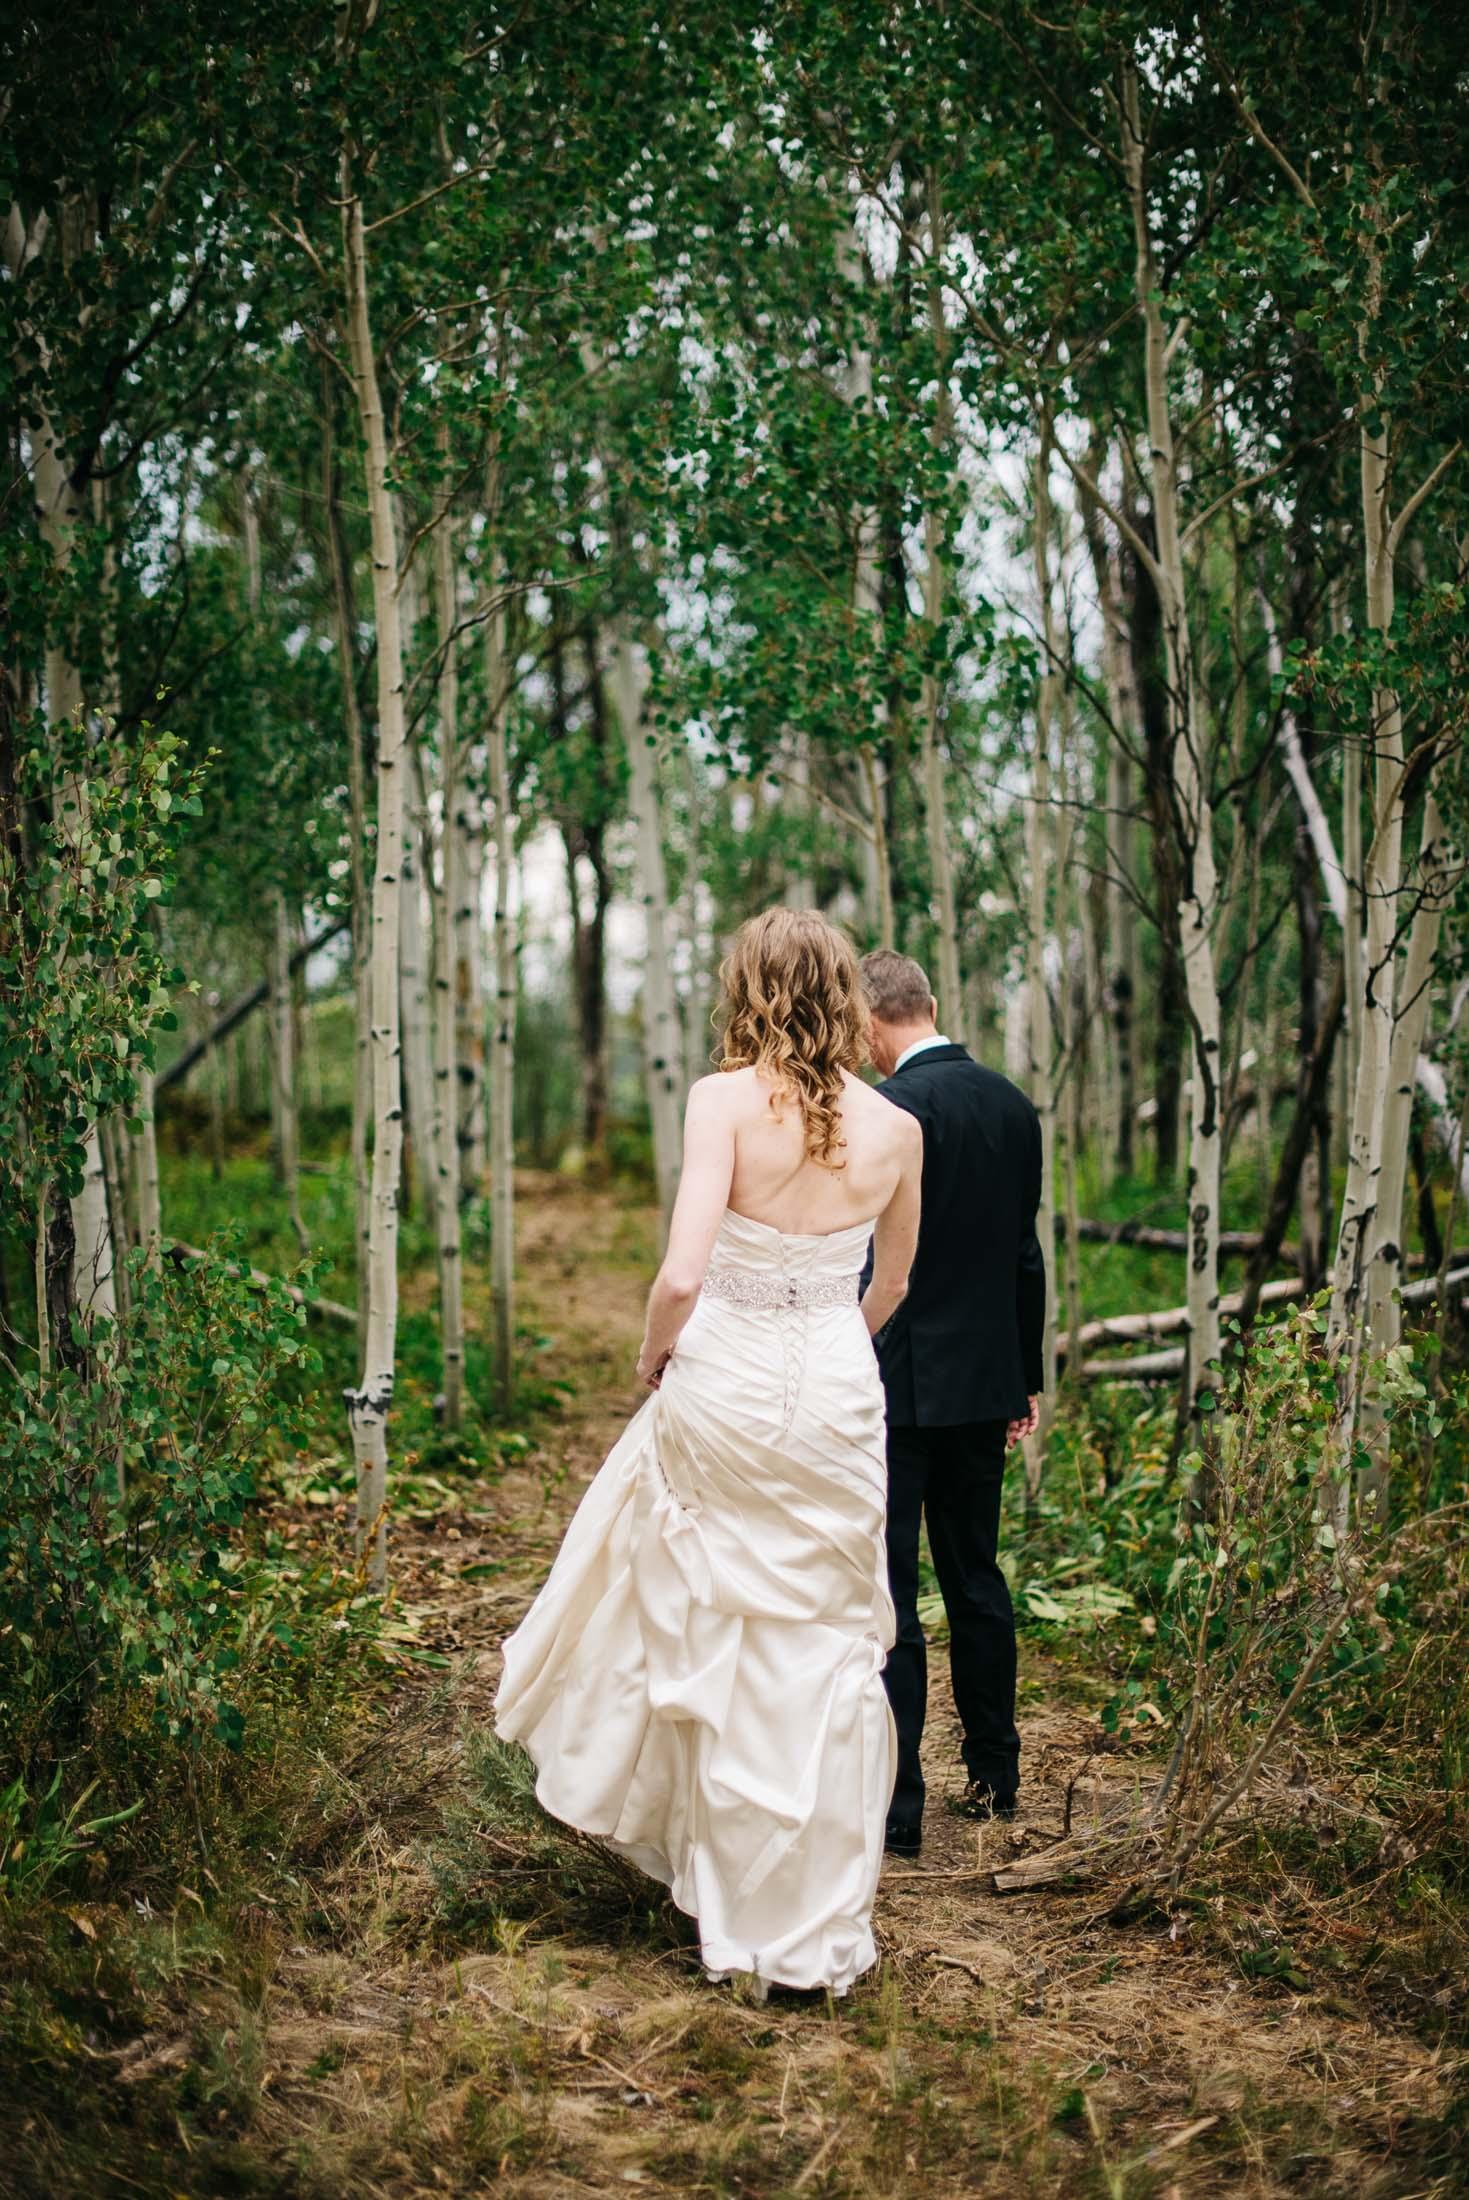 55elopement-photographer-colorado-snow-mountain-ranch-wedding-cynthia&chris-married1191.jpg